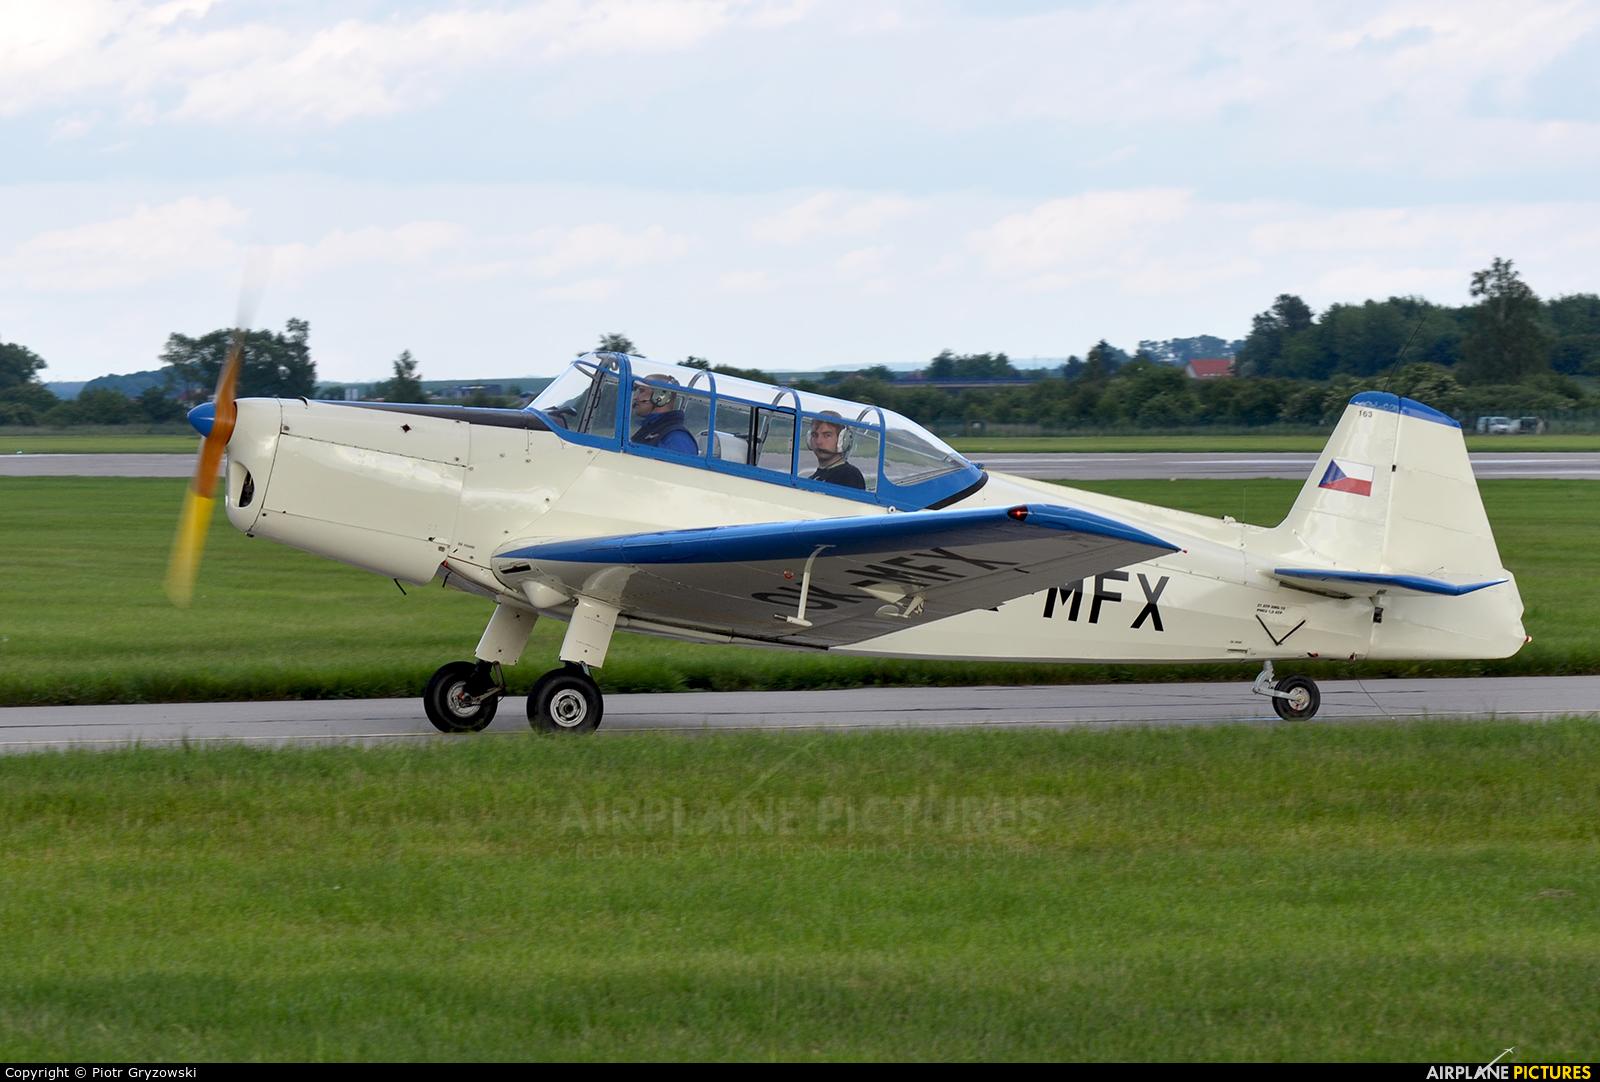 Východočeský aeroklub Pardubice OK-MFX aircraft at Pardubice